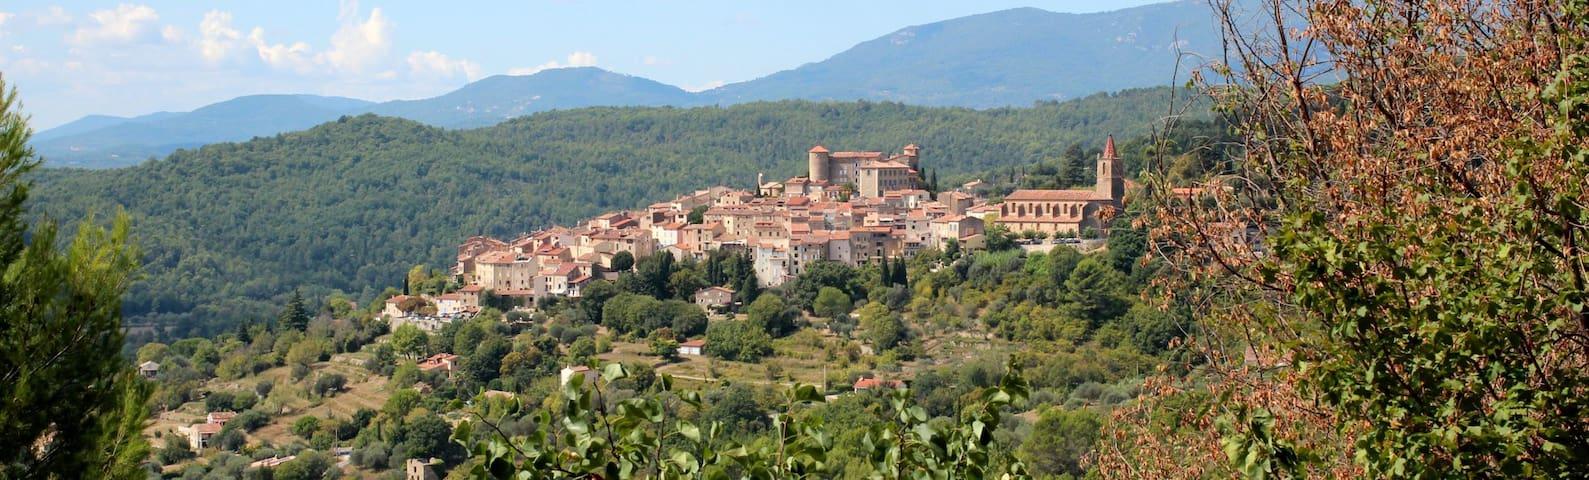 Les Clos Dia - Tourrettes Fayence France - Tourrettes - Condominio